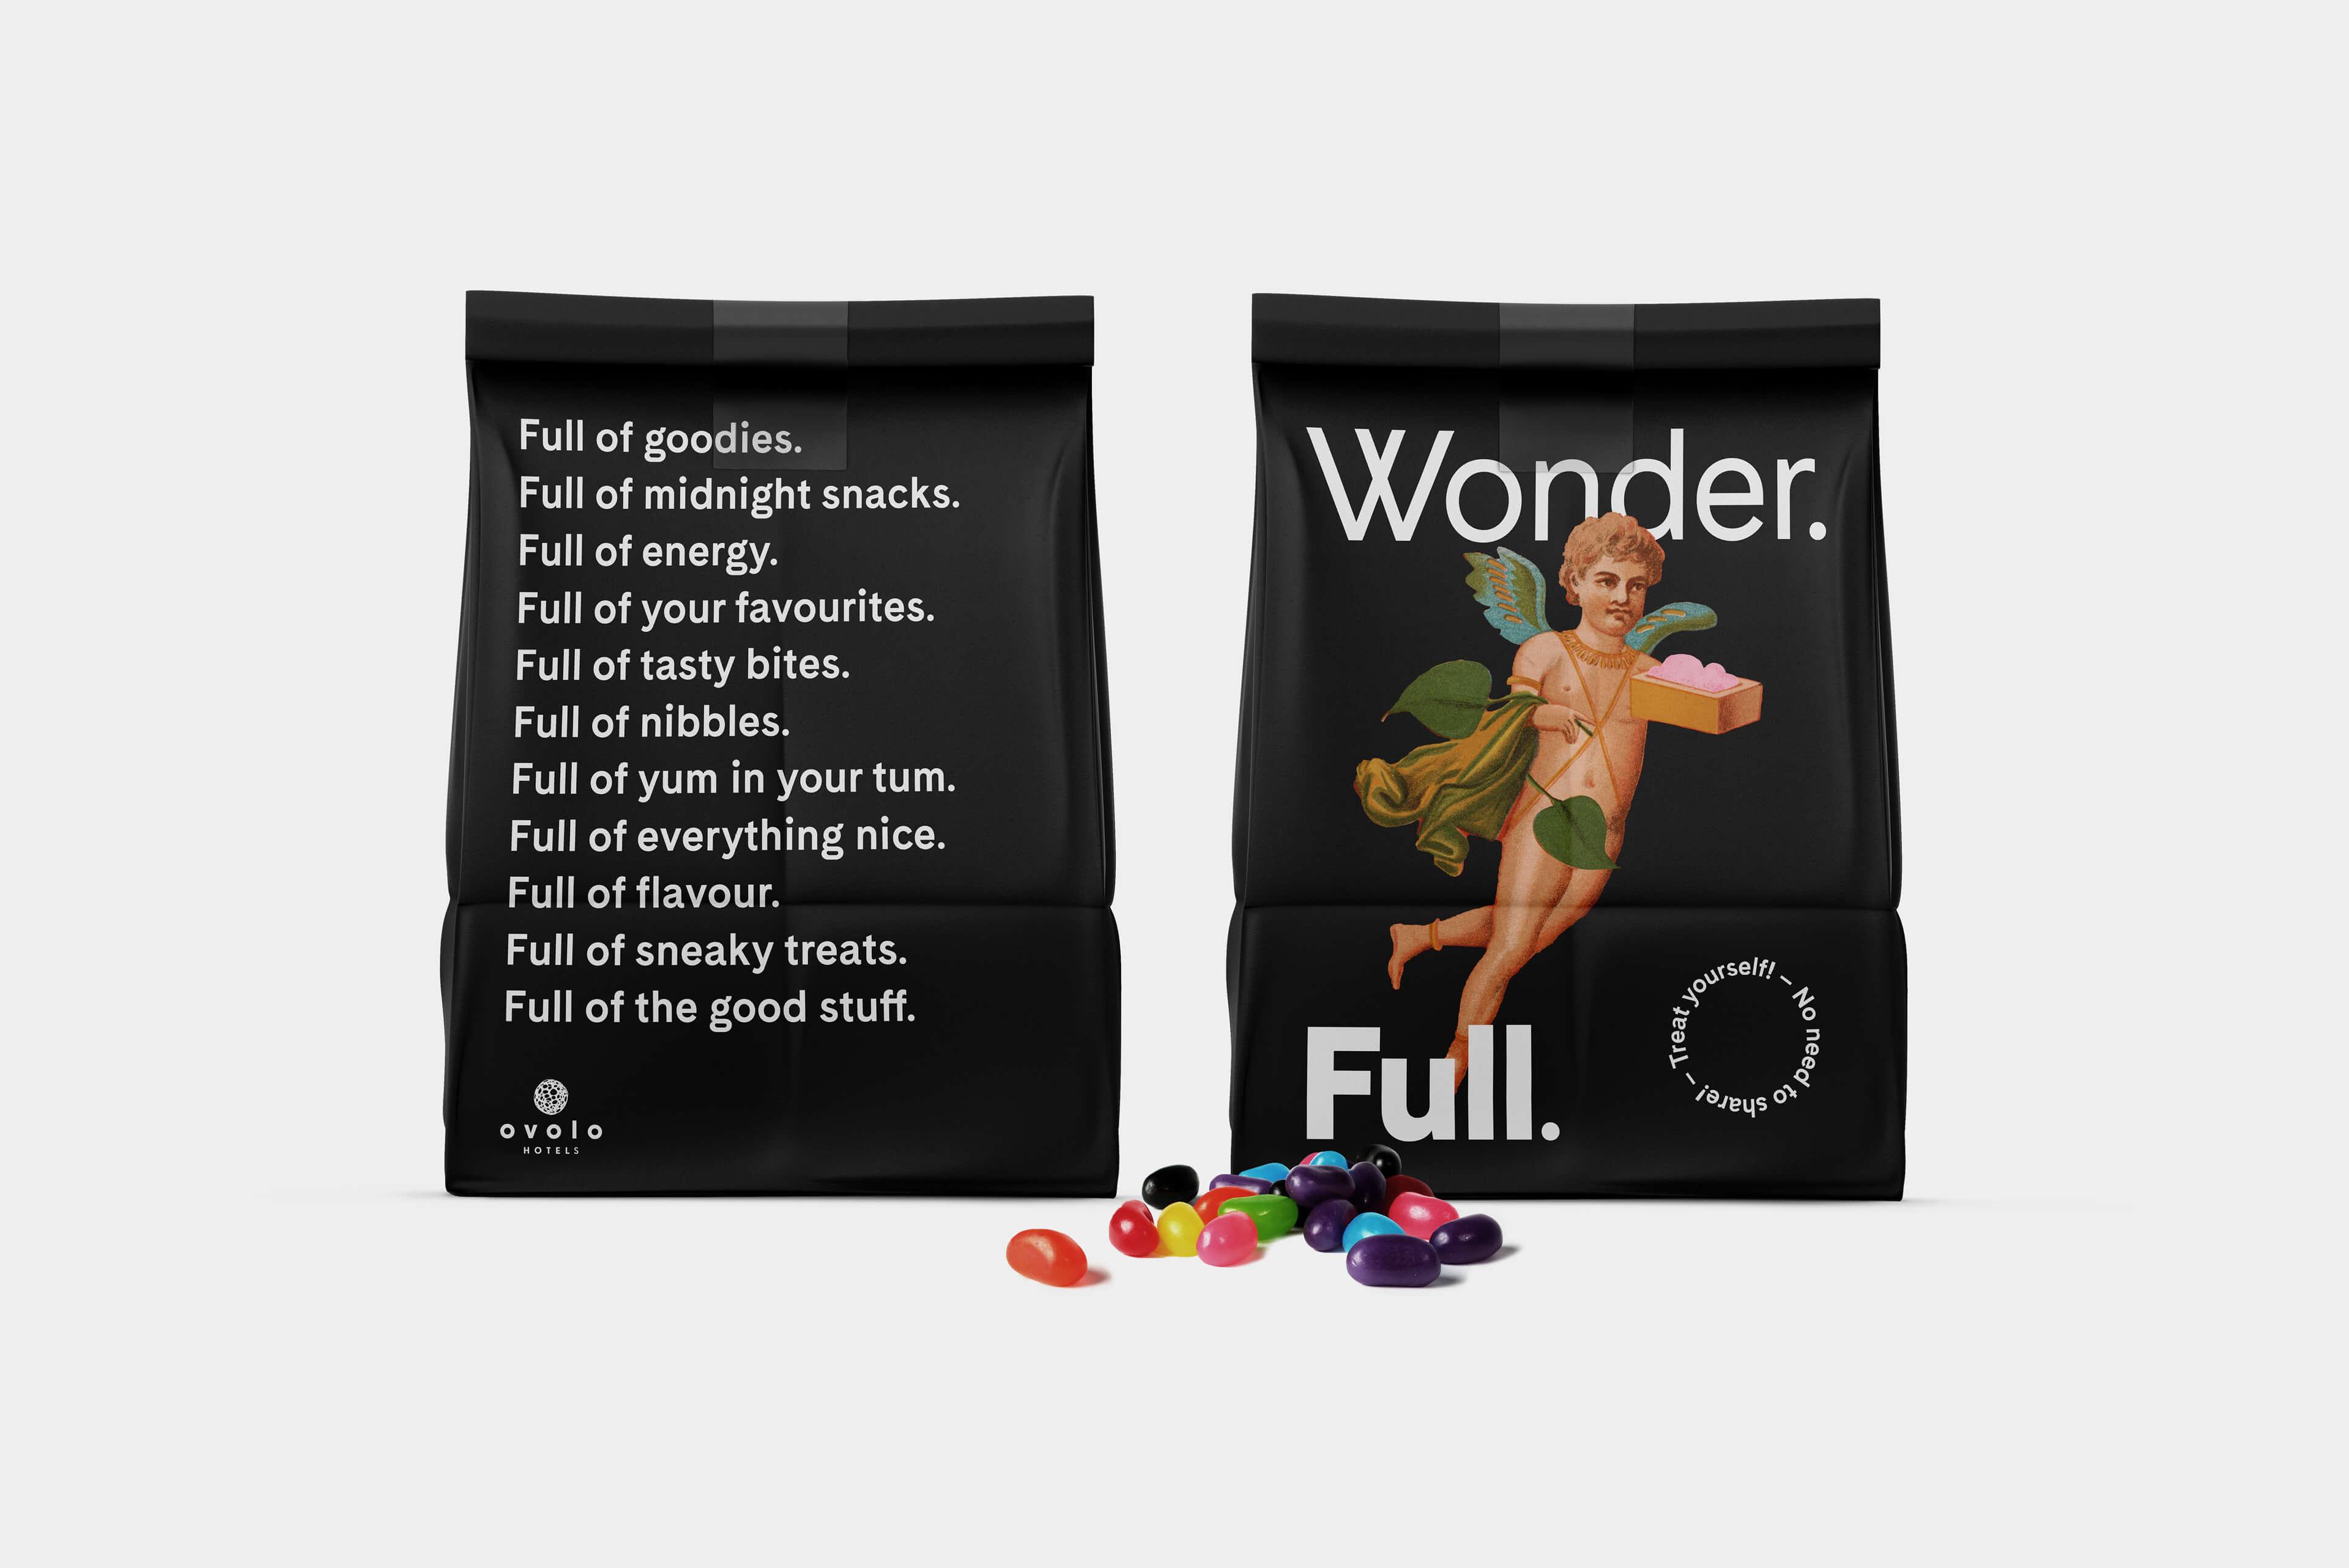 Ovolo Hotels Brand Refresh - Wonder. Full. Free Room Loot Bags